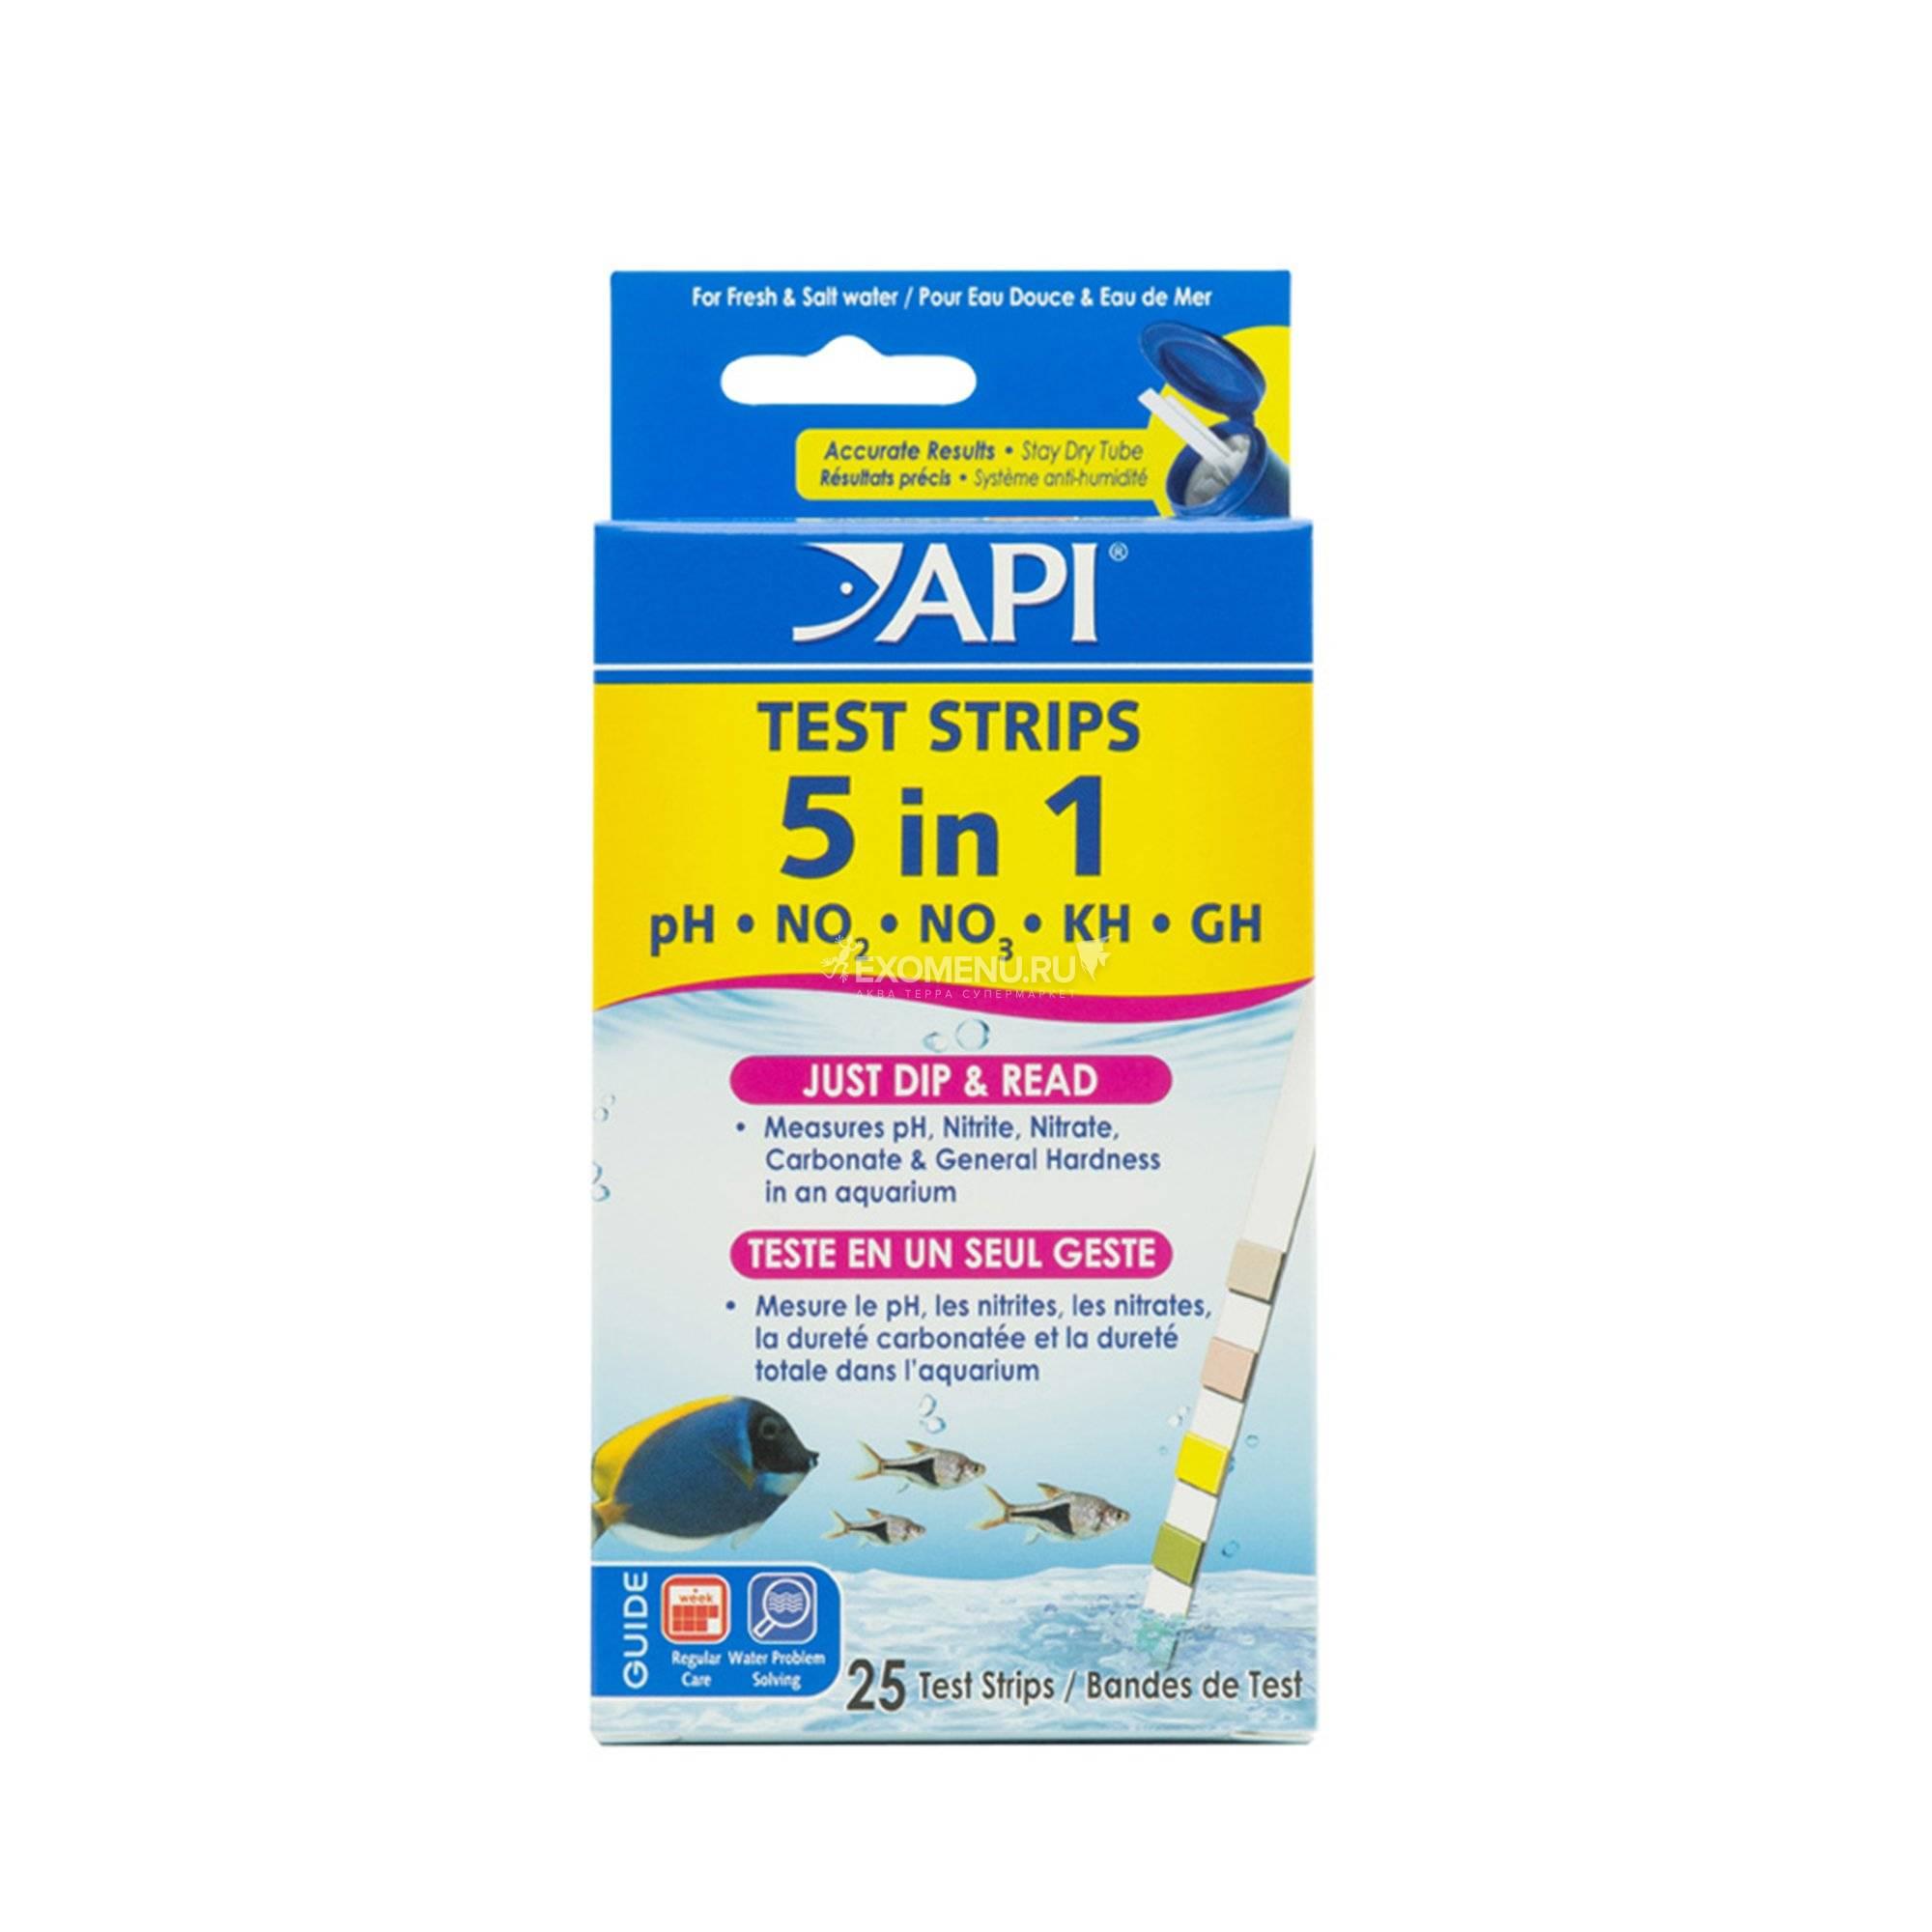 API 5 в 1 Аквариум Тест Стрипс - Полоски для экспресс тестов аквариумной воды 5 in 1 Aquarium Test S